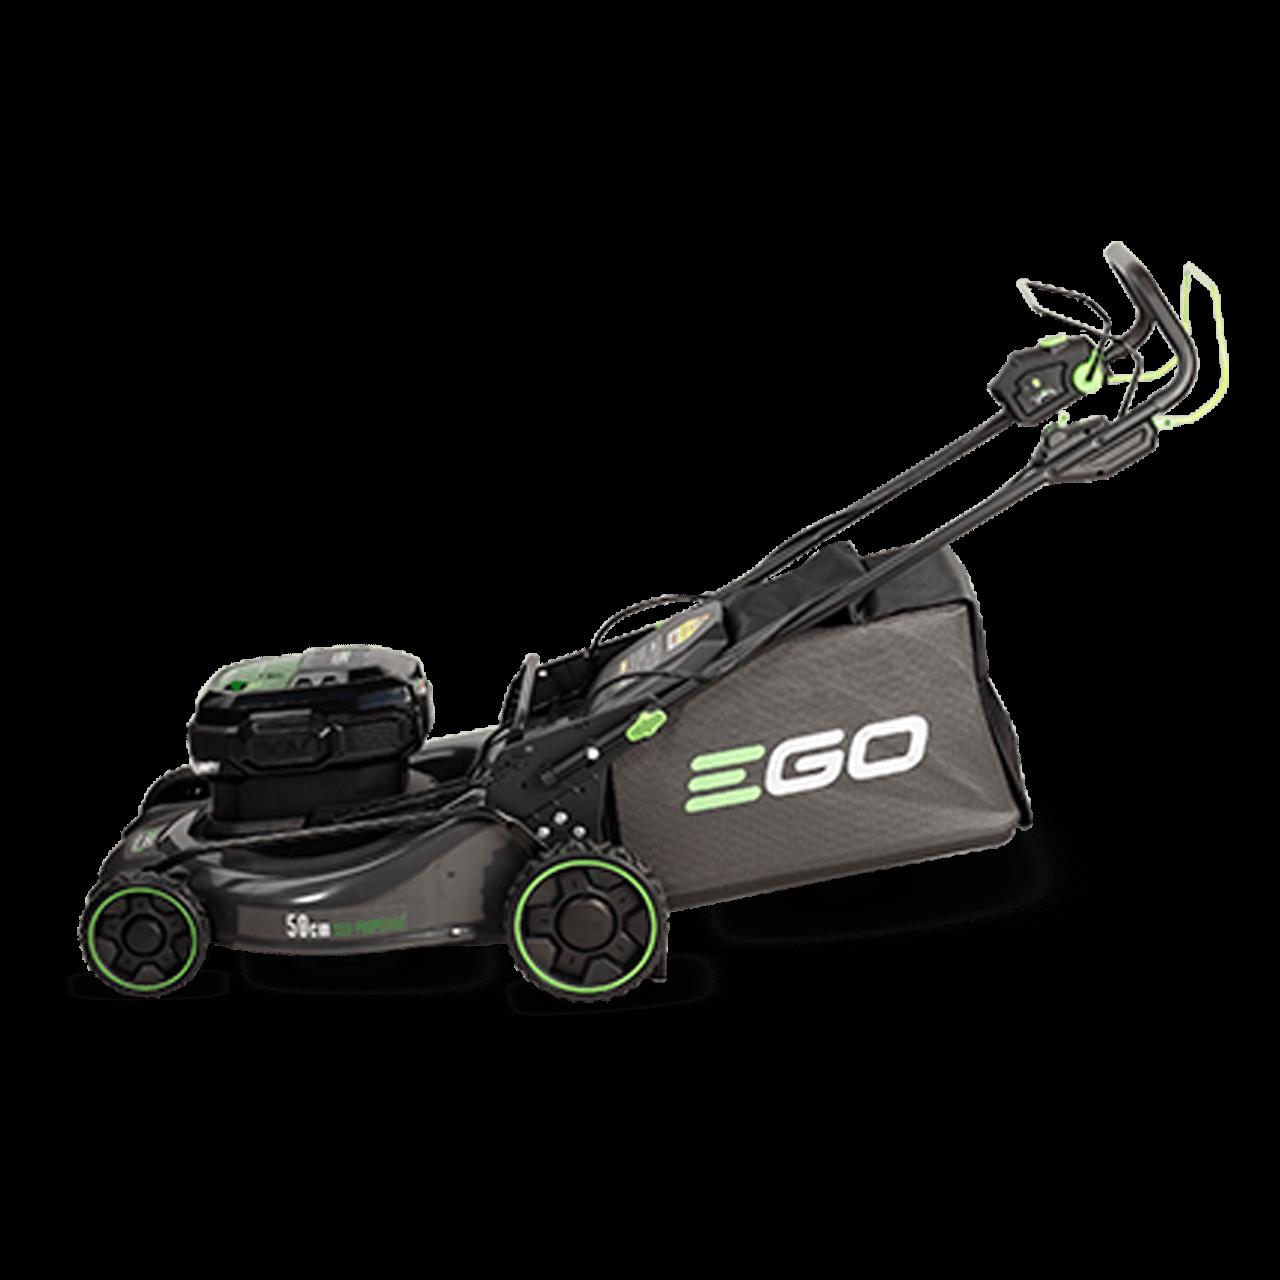 Lm2014e Sp 50cm Self Propelled Mower Ego Power